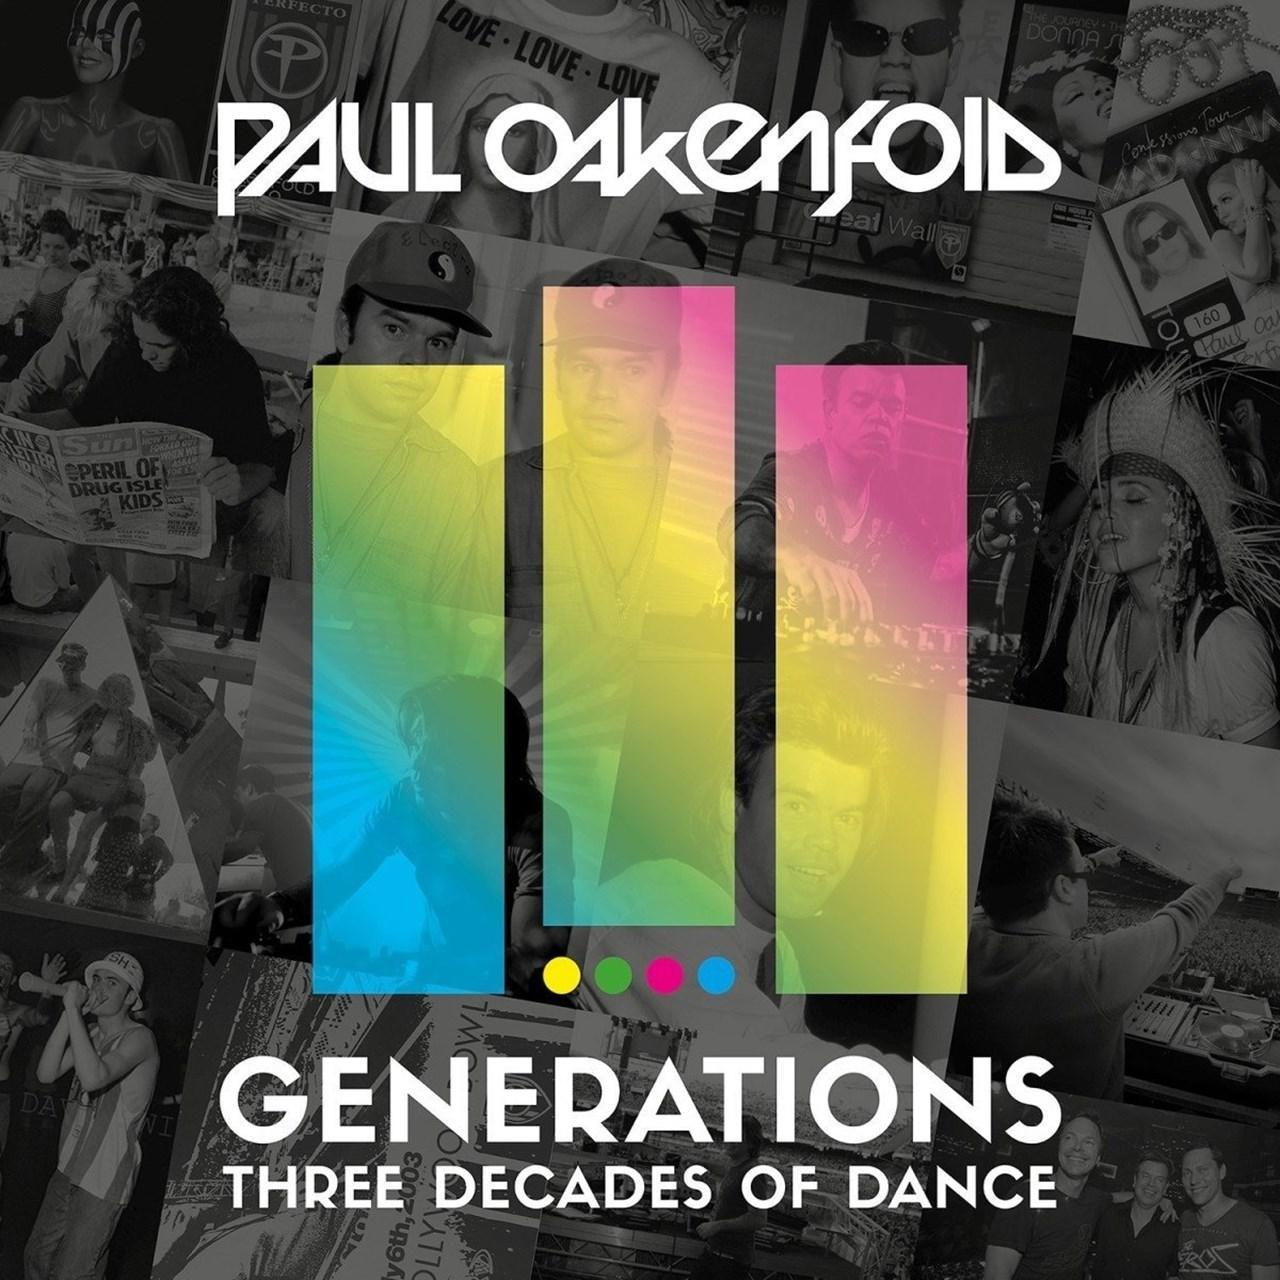 Generations: Three Decades of Dance - 1